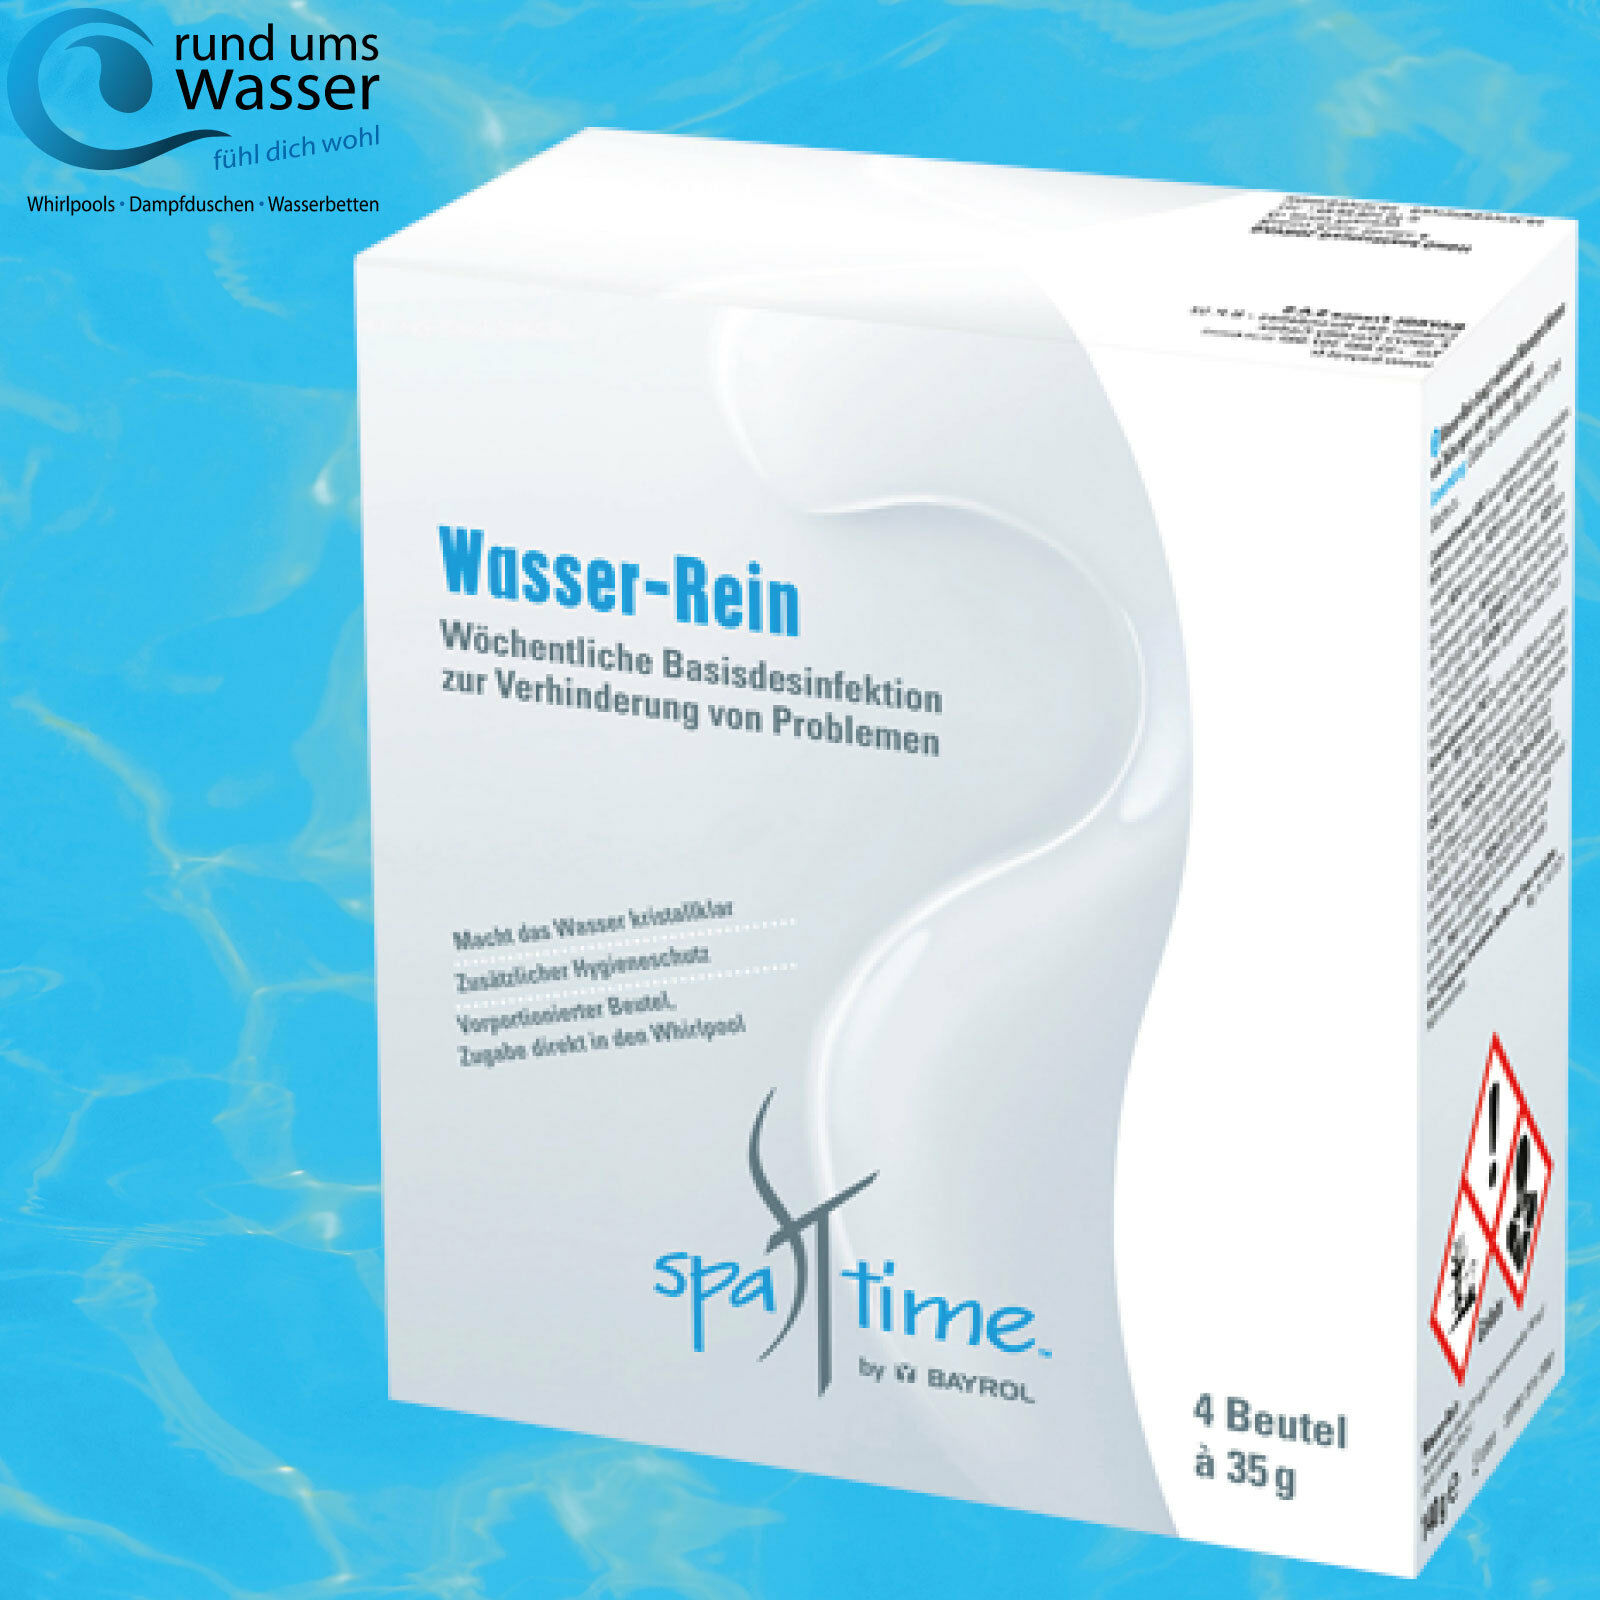 Bayrol SpaTime Whirlpool Wasser Rein Rein Rein 4 x 35 g Spa Time Pool Pflege Wasserrein aa5be1